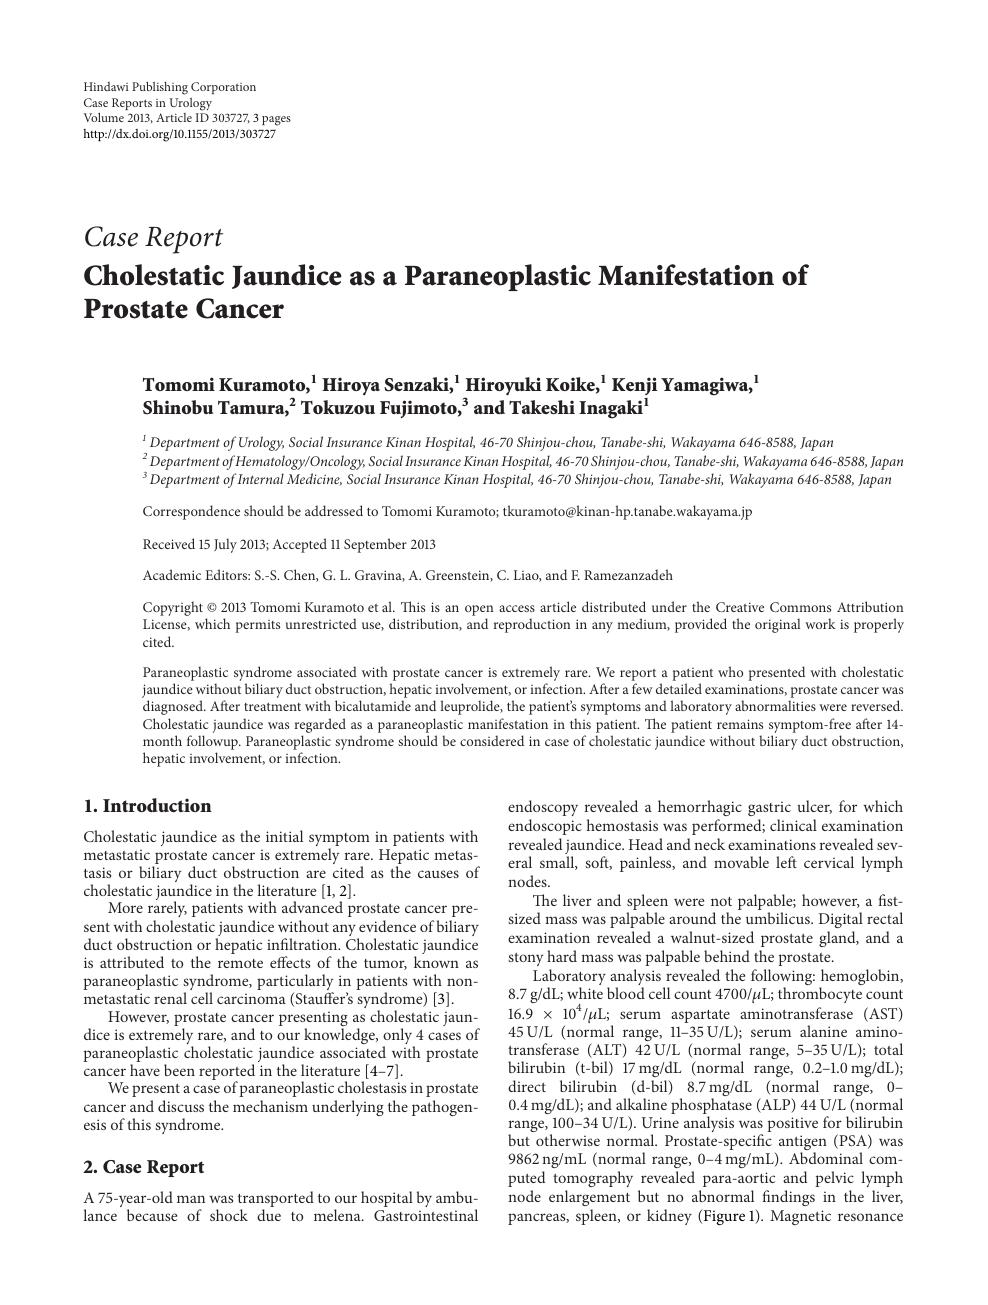 sindrome paraneoplastica prostata